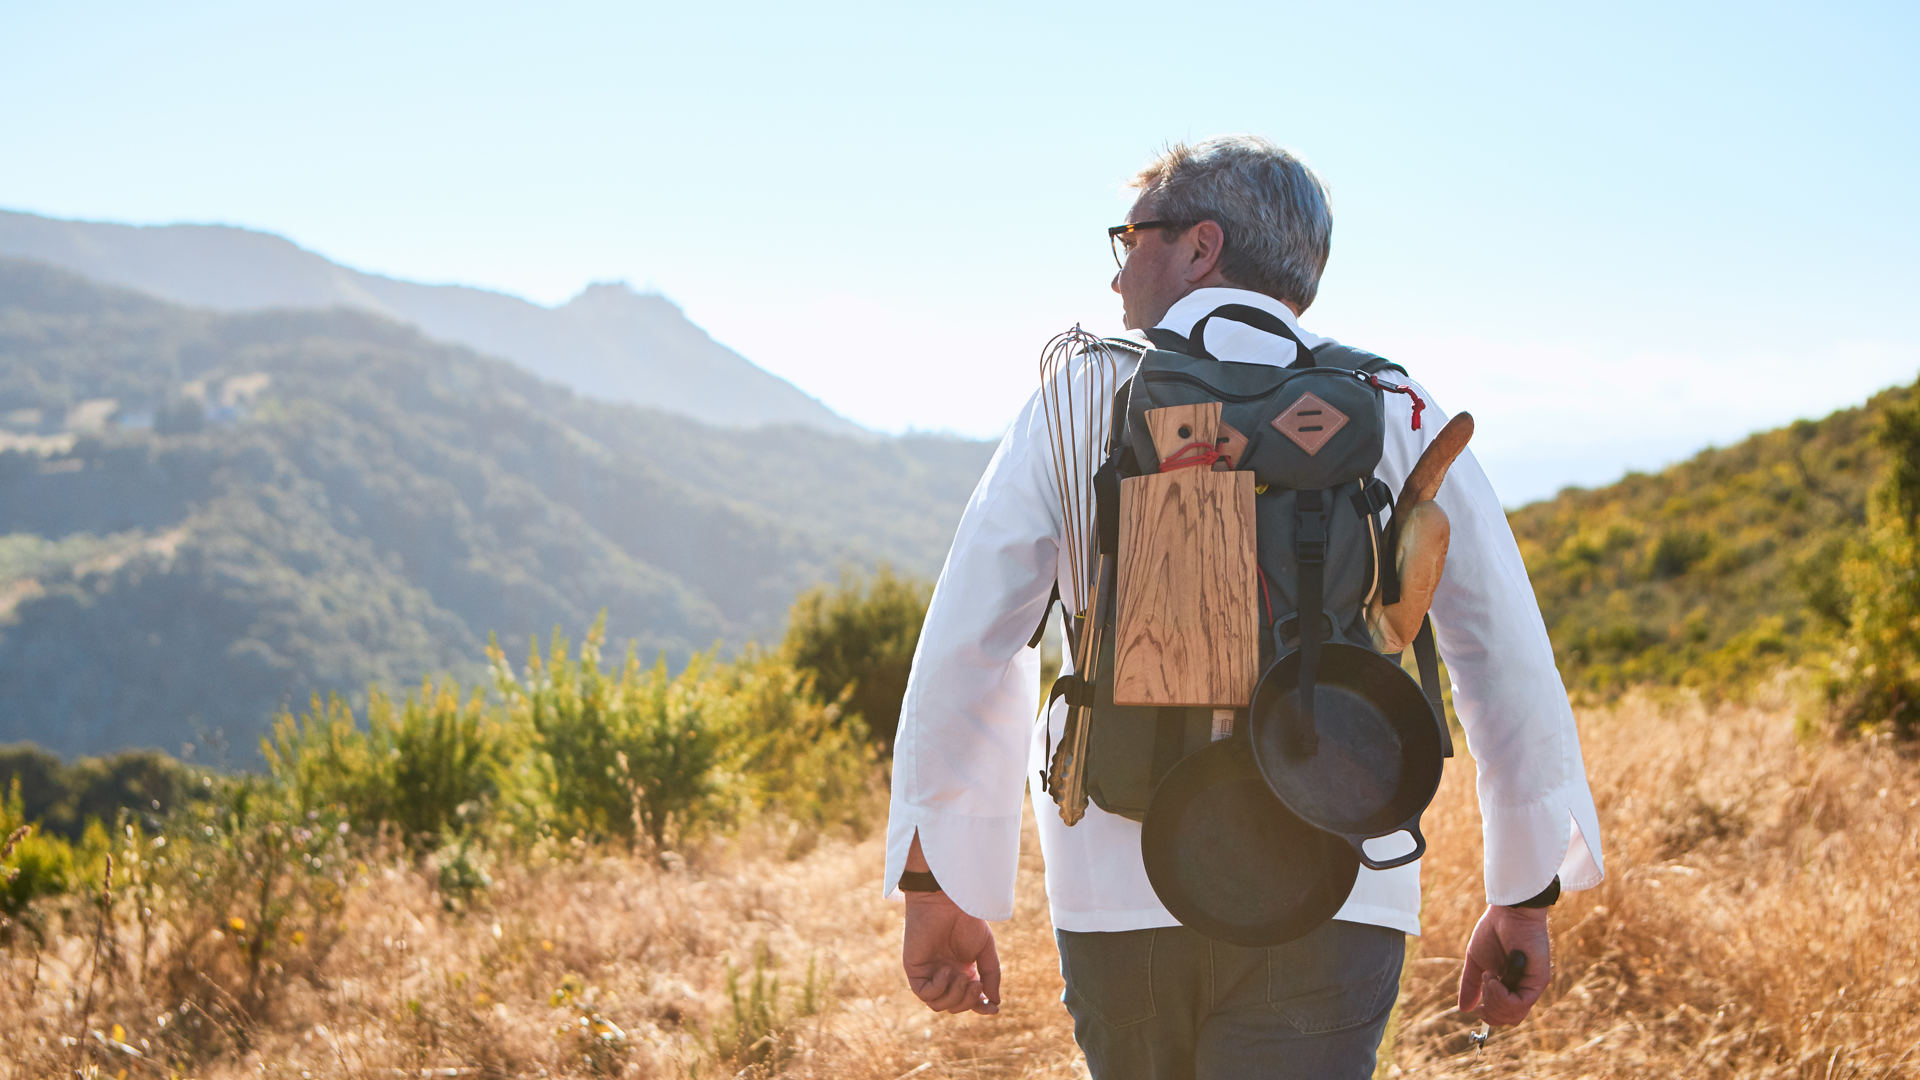 Carmel Valley Ranch_Lifestyle_Chef backpack_GJ_N5I3329_v1_current